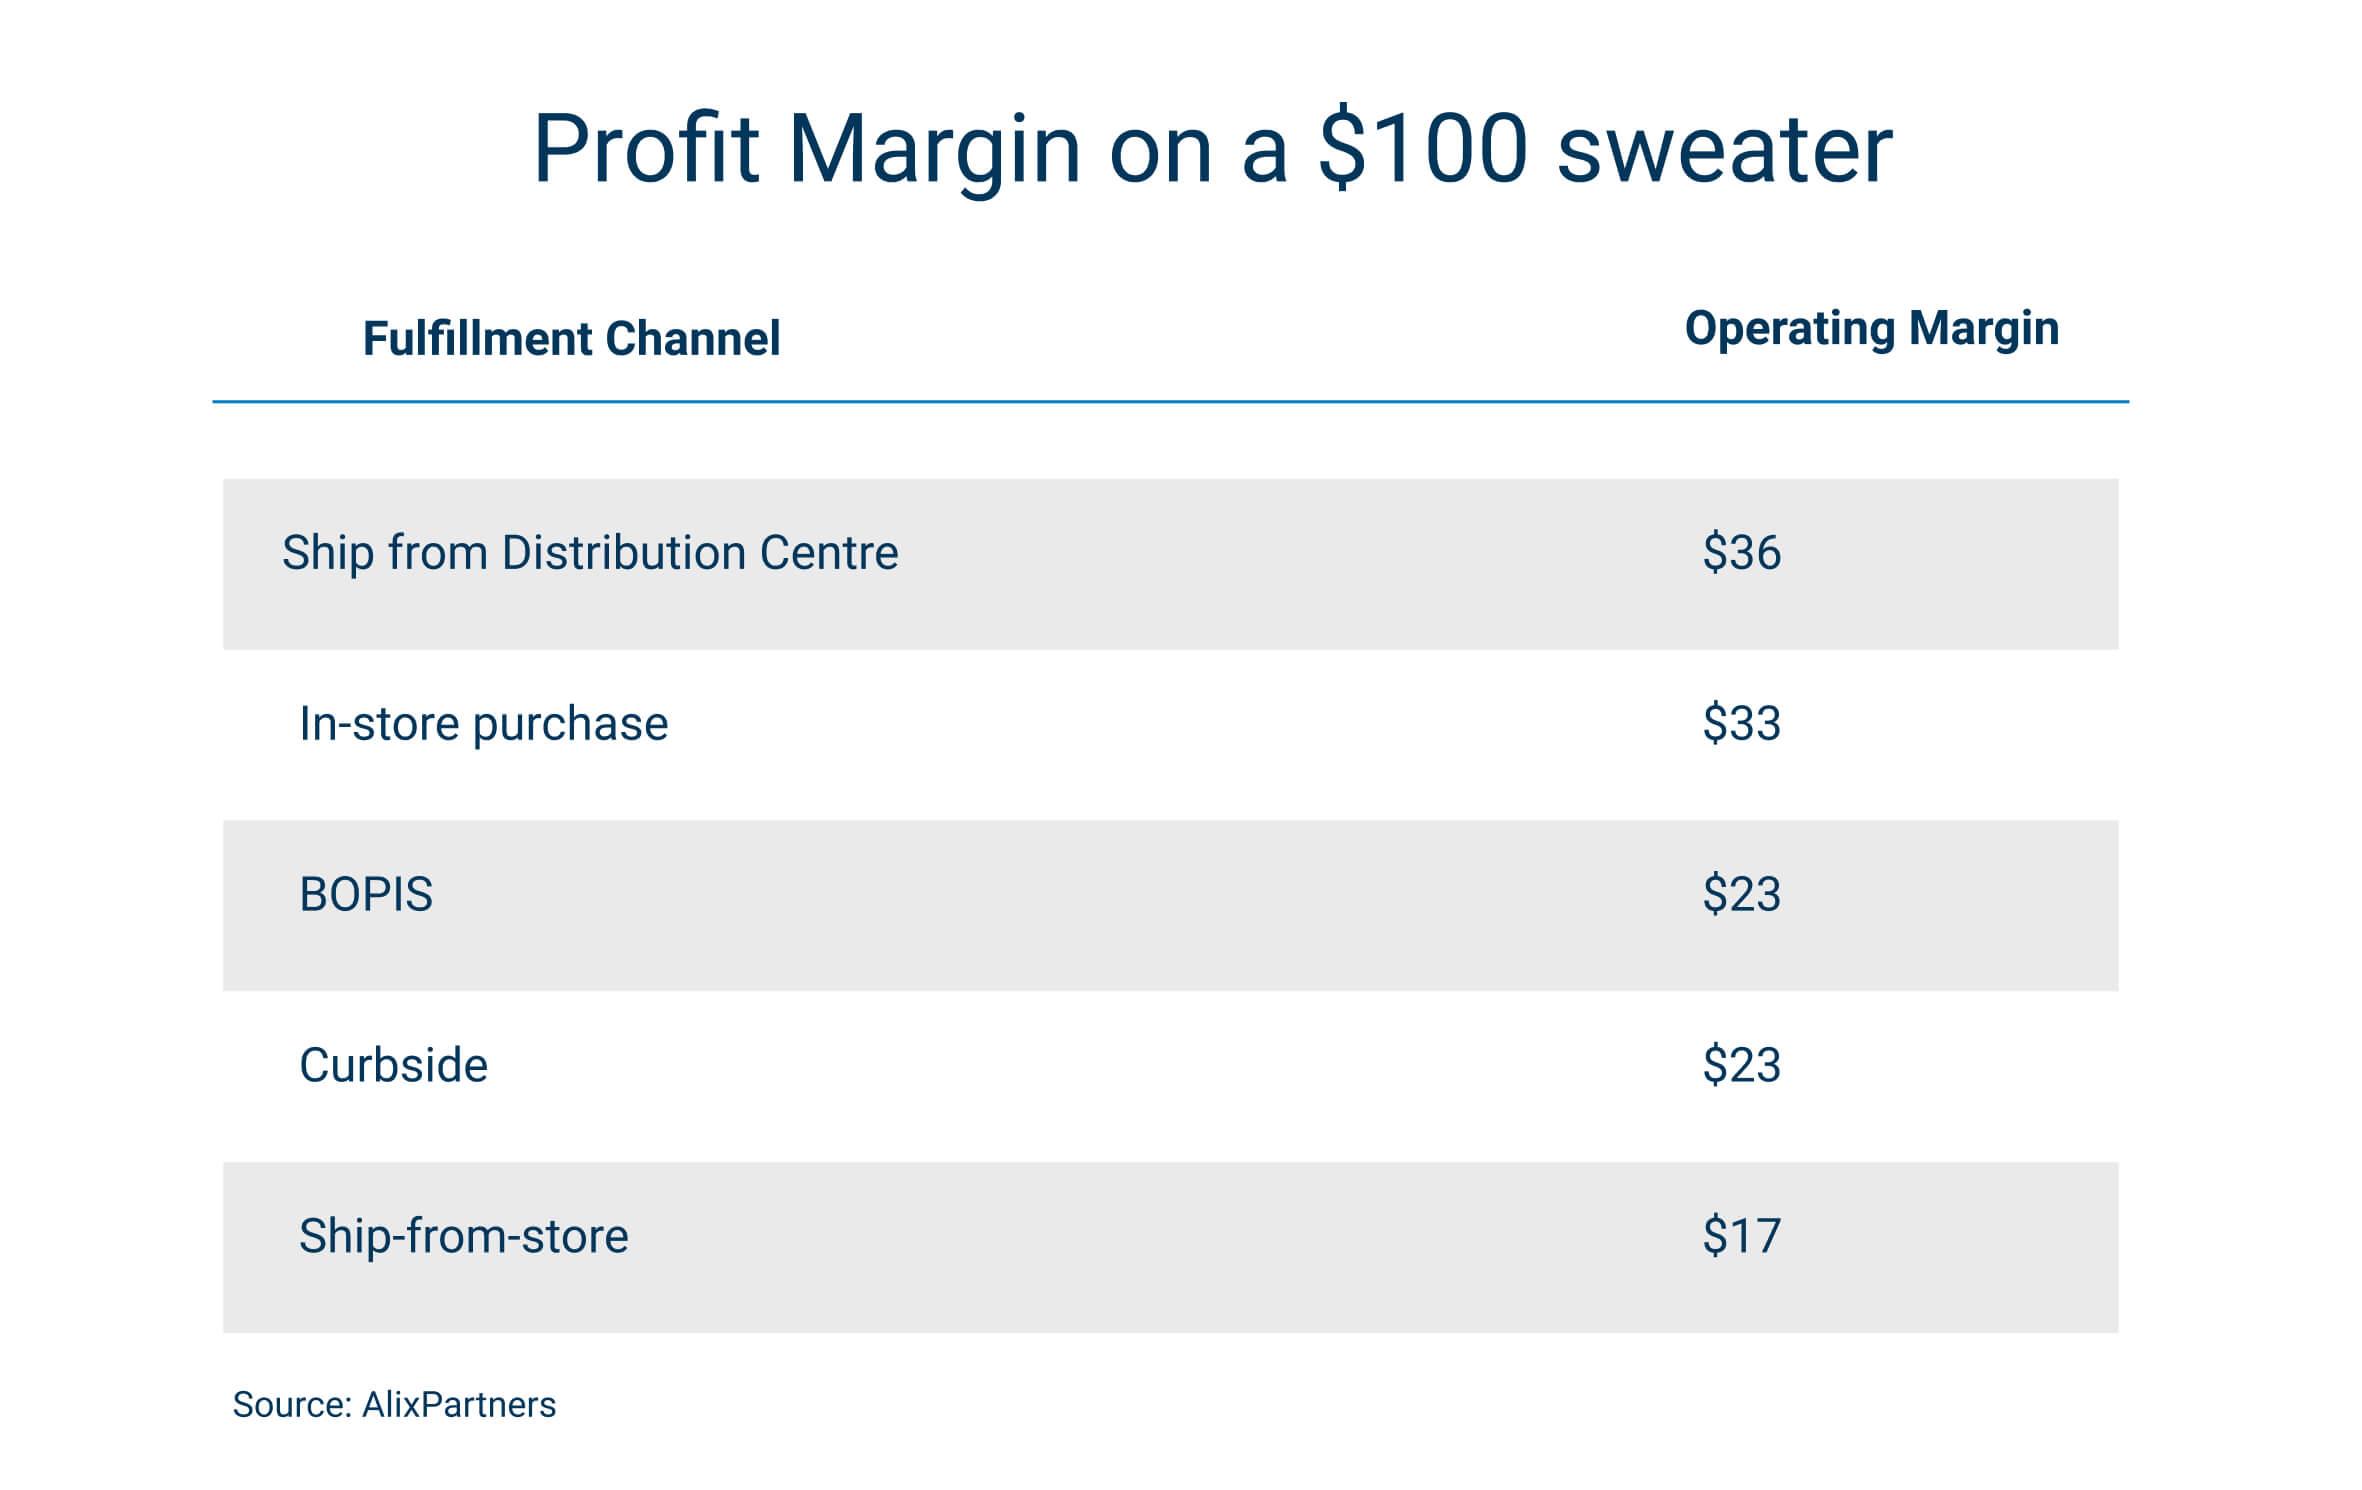 Omnichannel profit margins